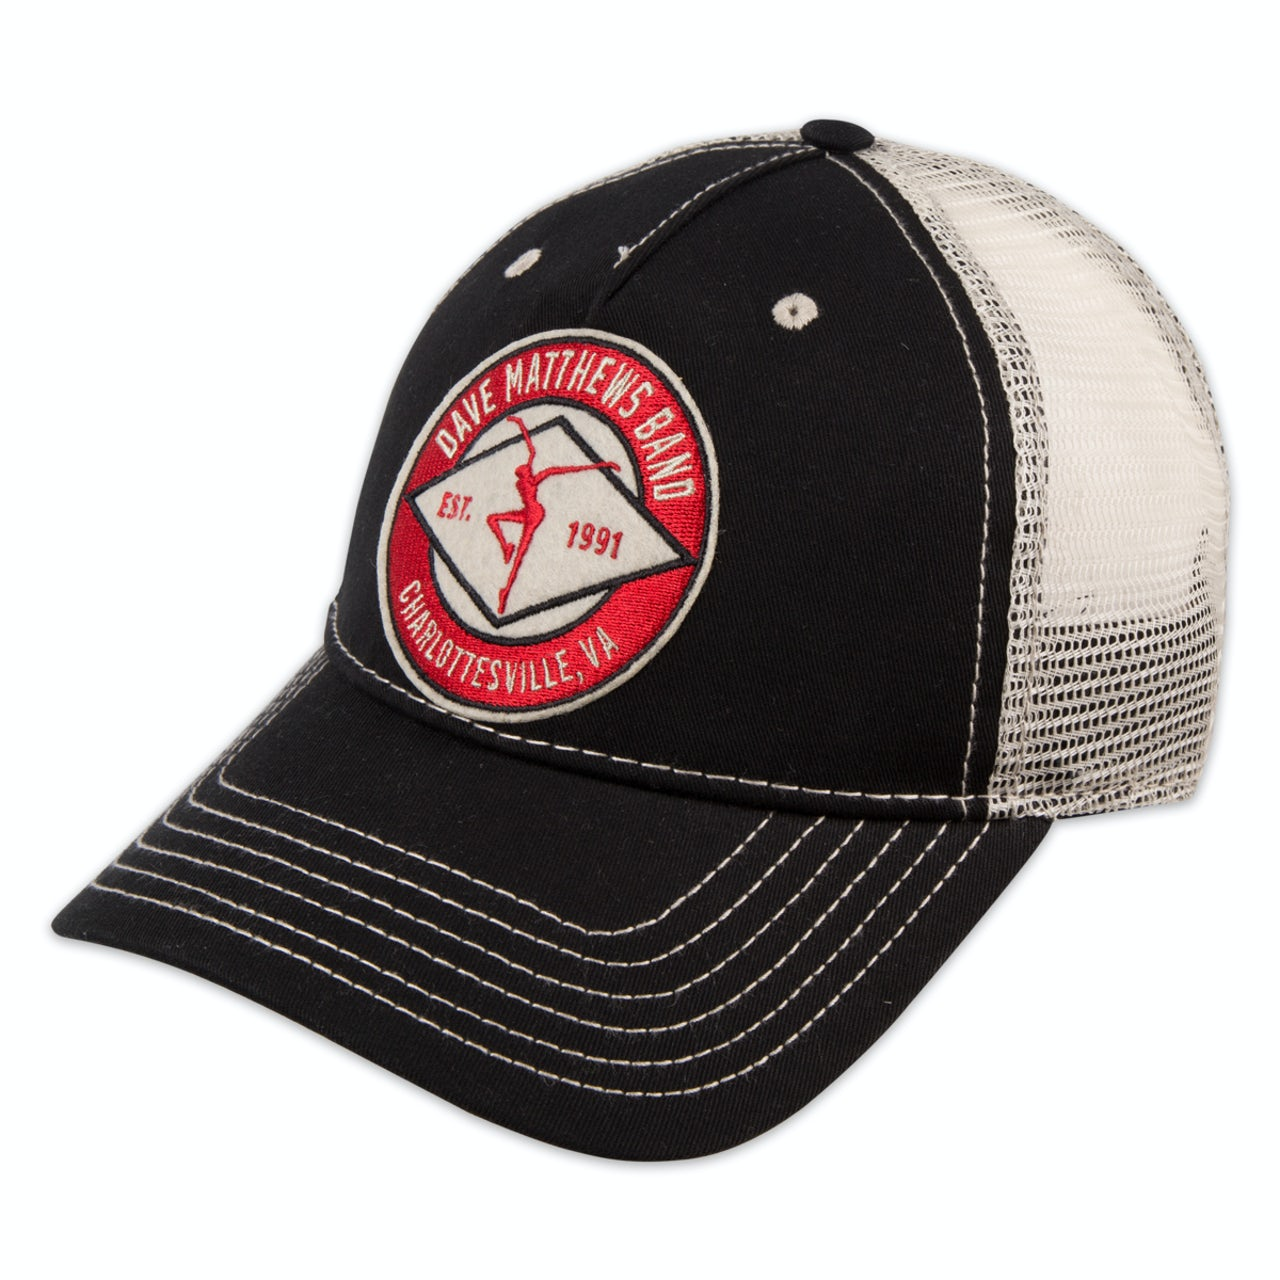 d35365829 Dave Matthews Band Black Trucker Hat